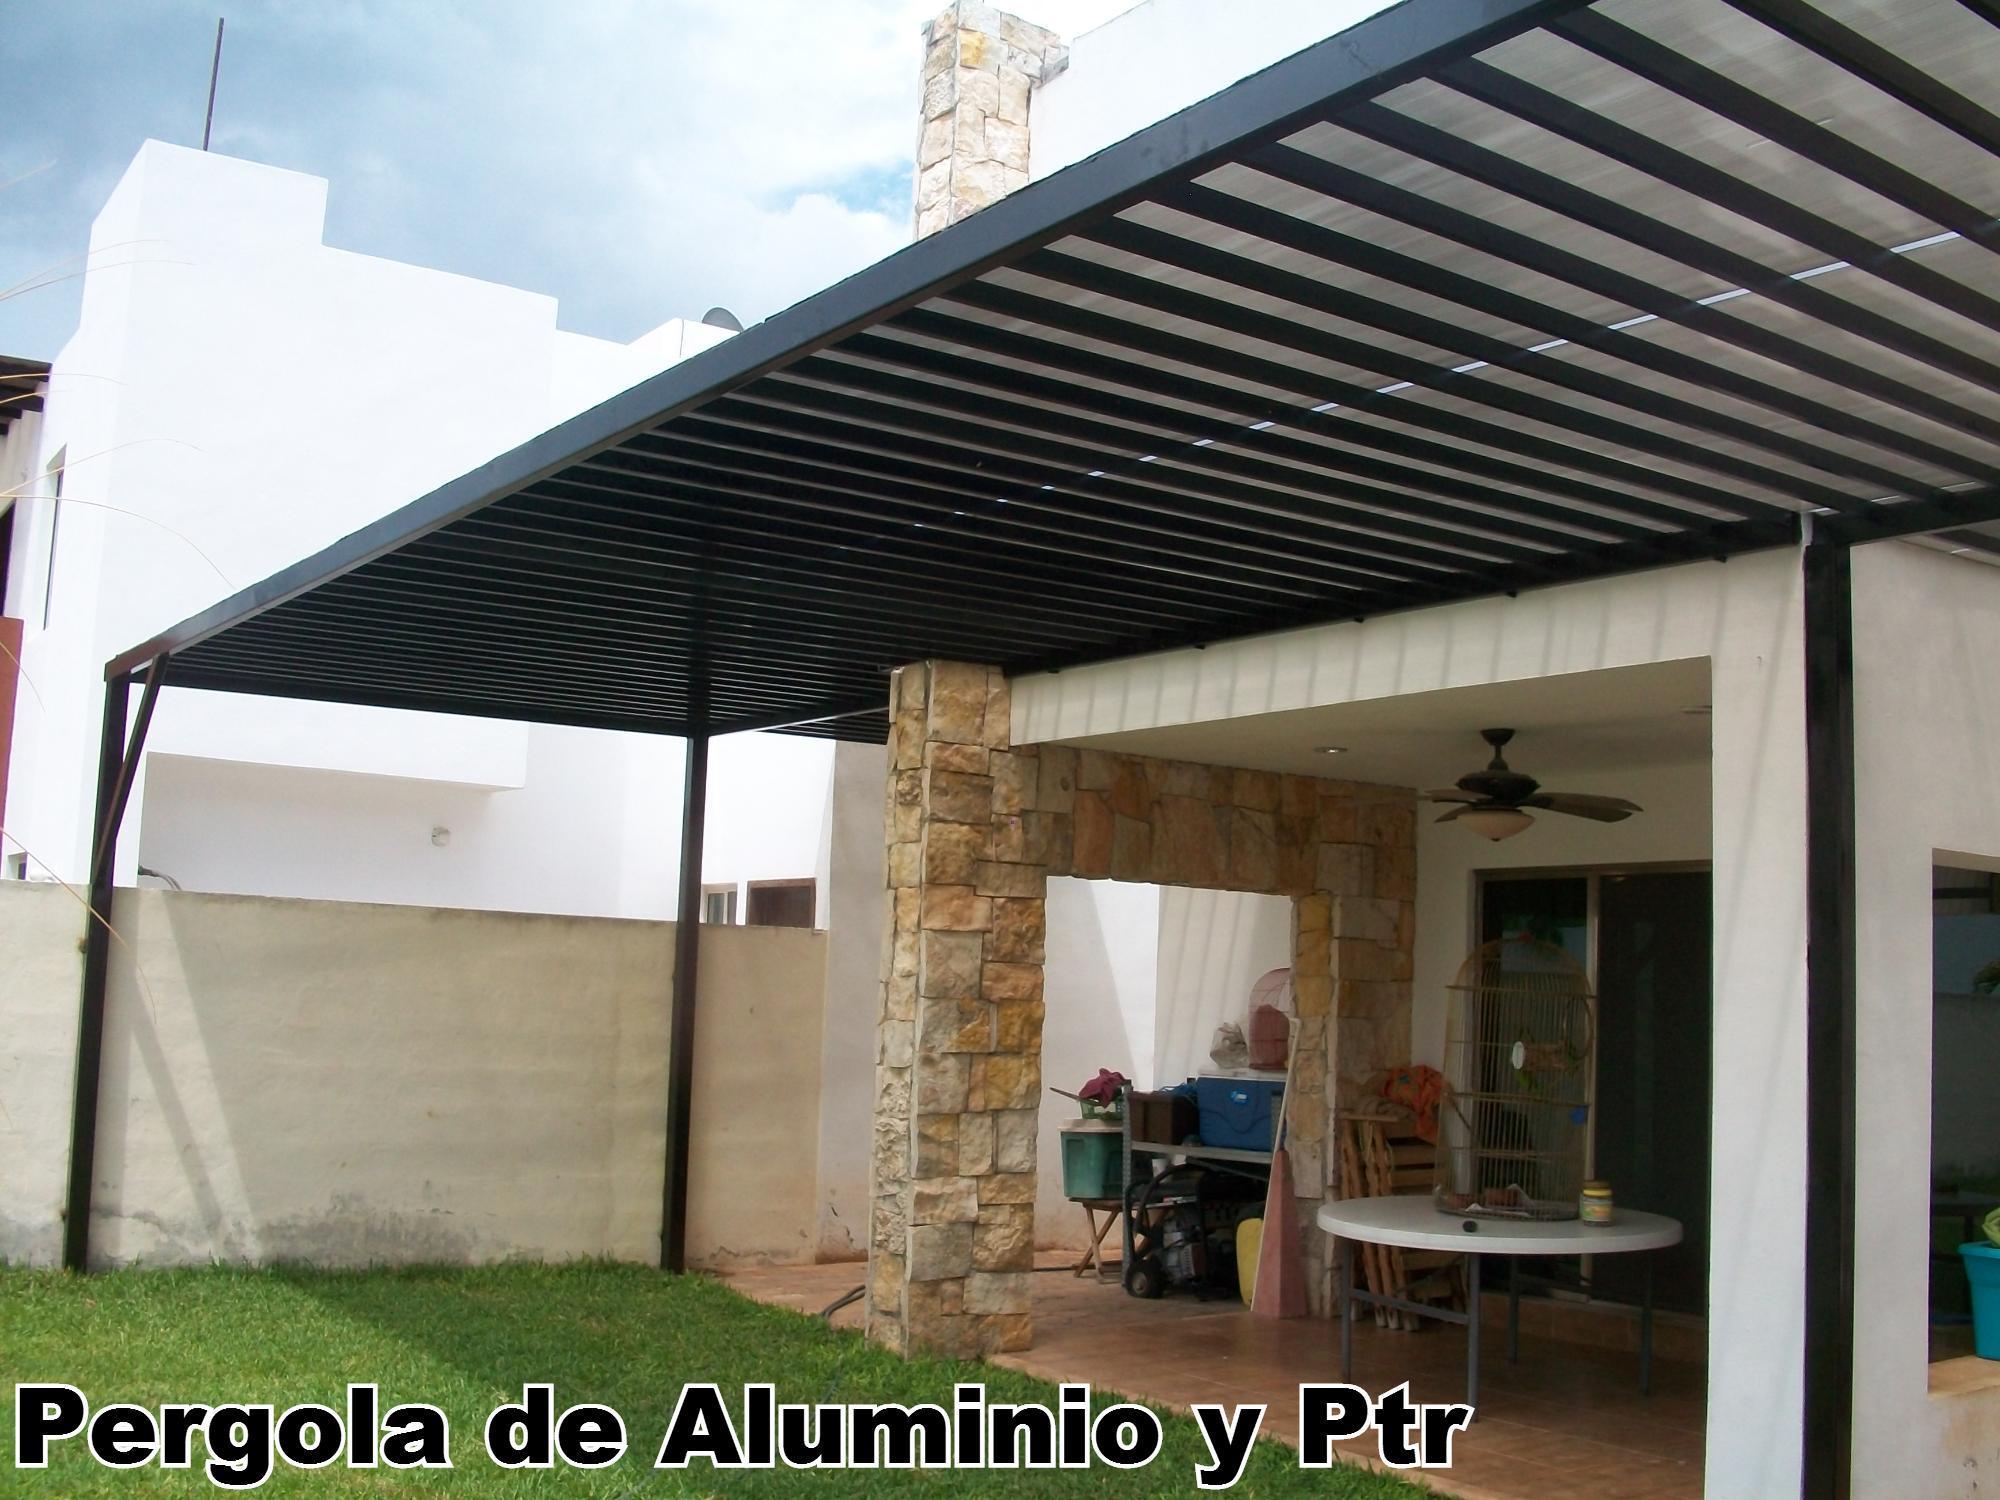 30 model pergolas metalicas con policarbonato - Pergolas de aluminio para jardin ...